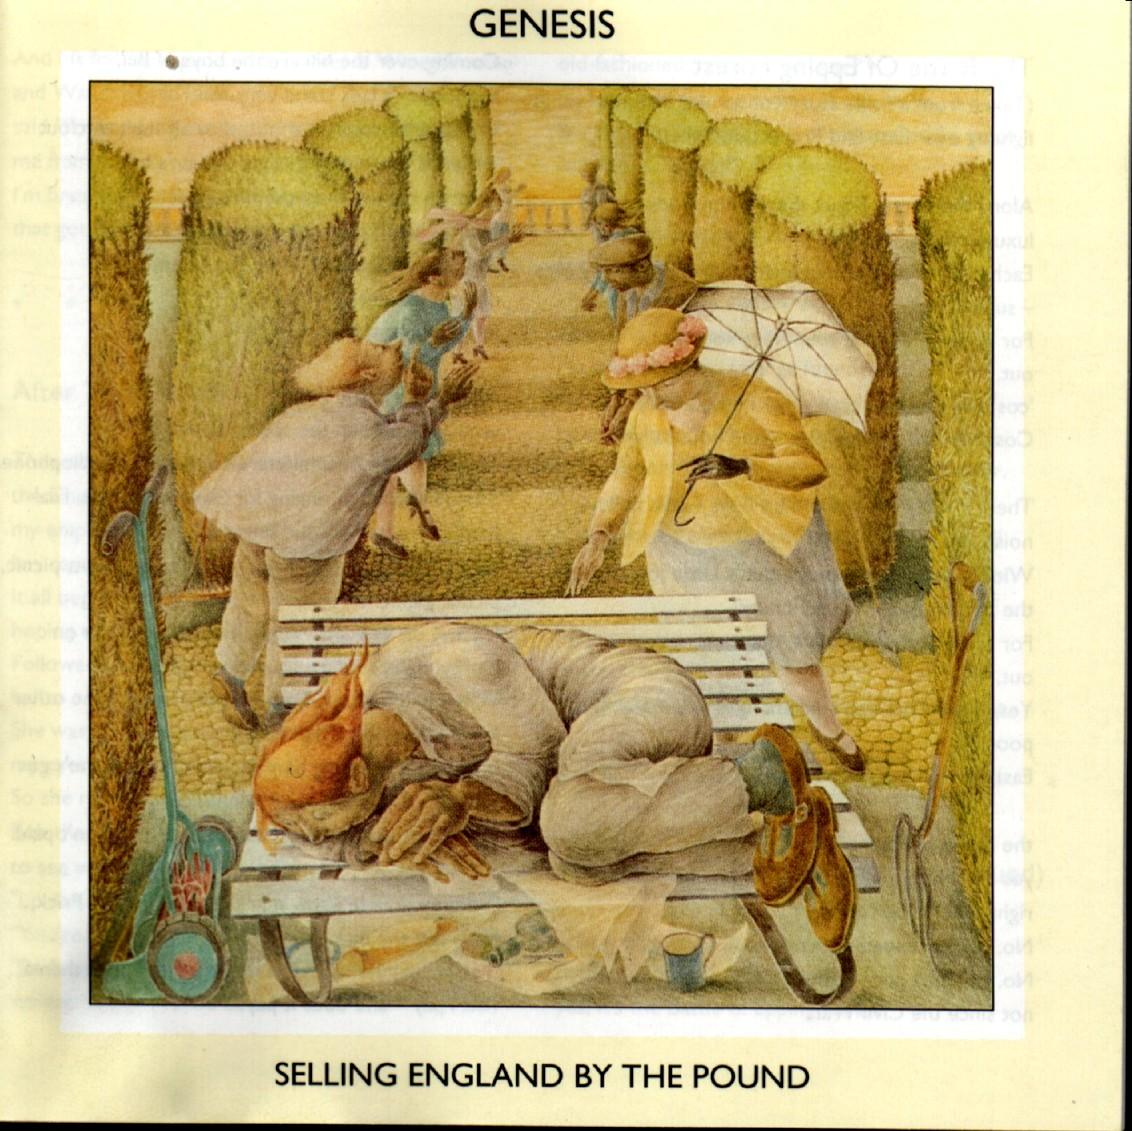 http://4.bp.blogspot.com/-DYTKV2NKnrA/T_j3Hz2Tp0I/AAAAAAAAAKs/uHjBXU0HHa8/s1600/Genesis_Selling_England_by_the_pound.jpg